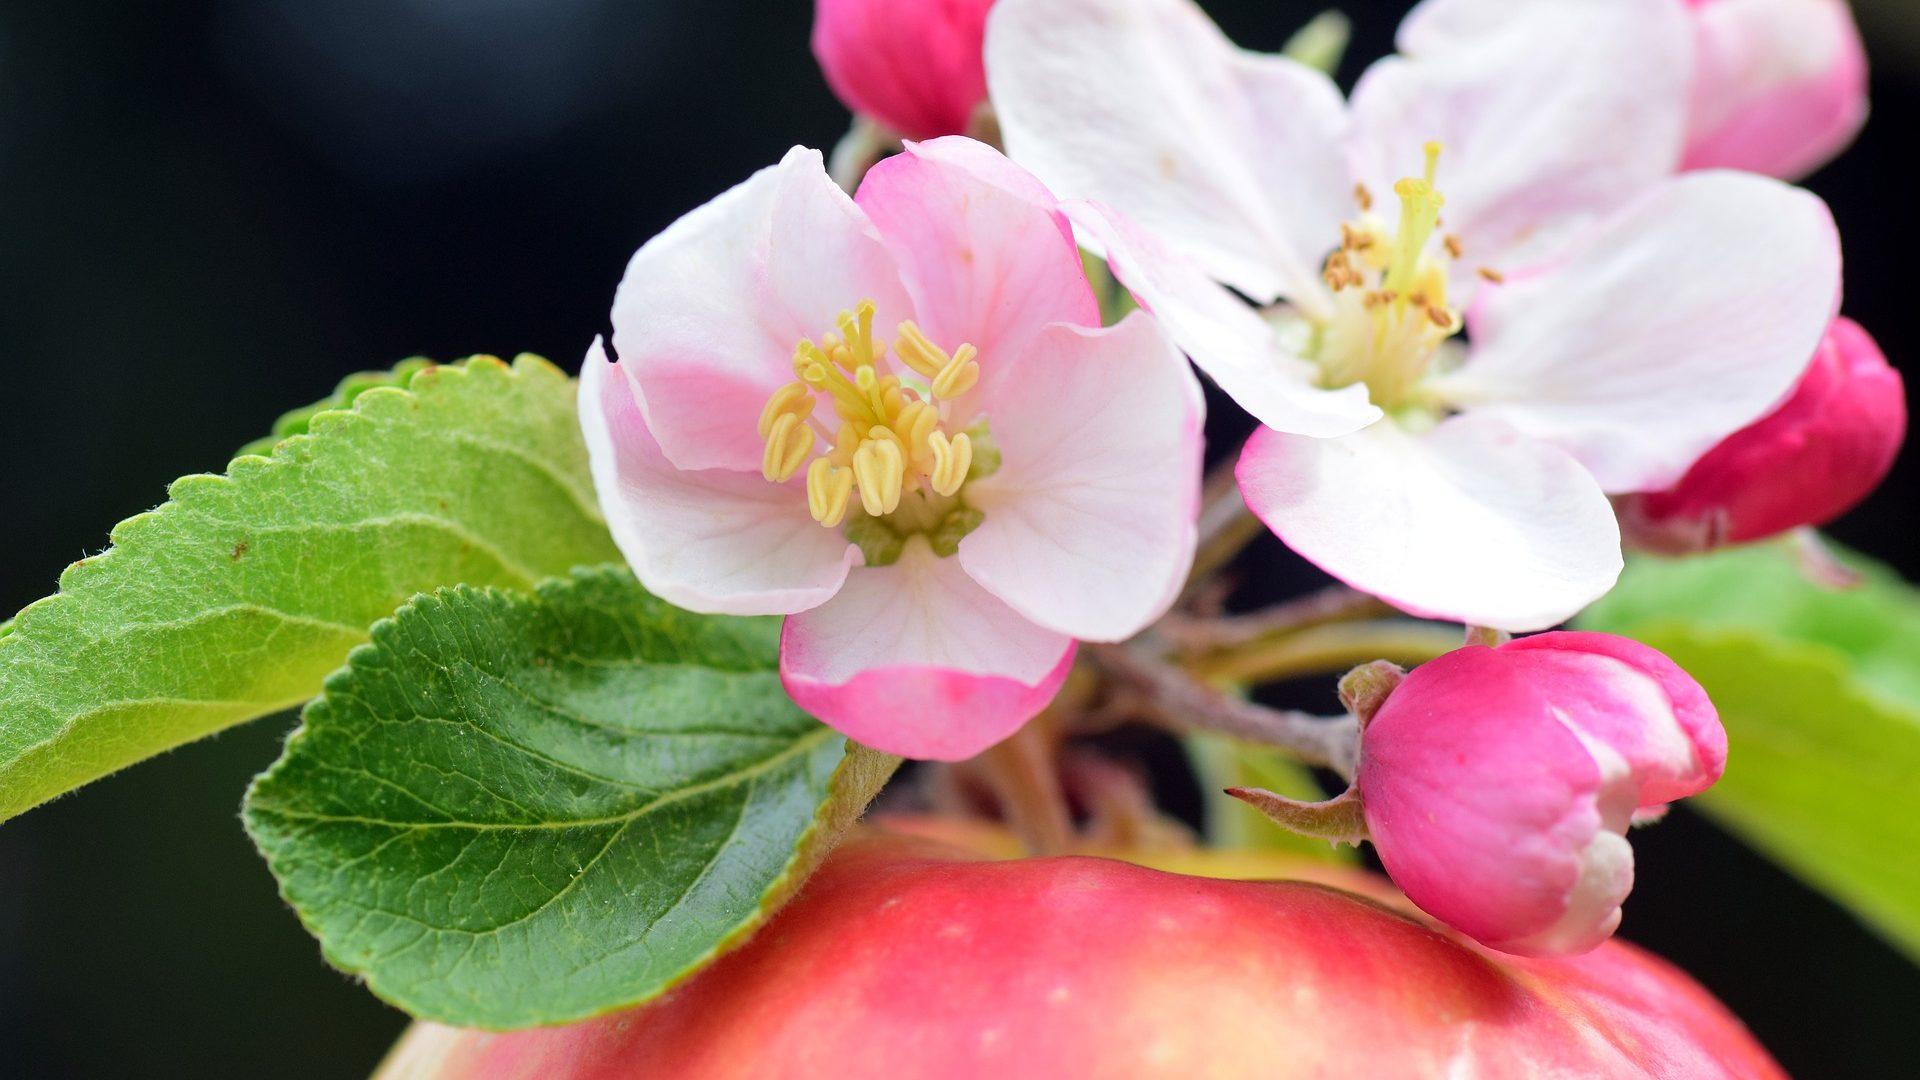 apple blossom-2274007_1920